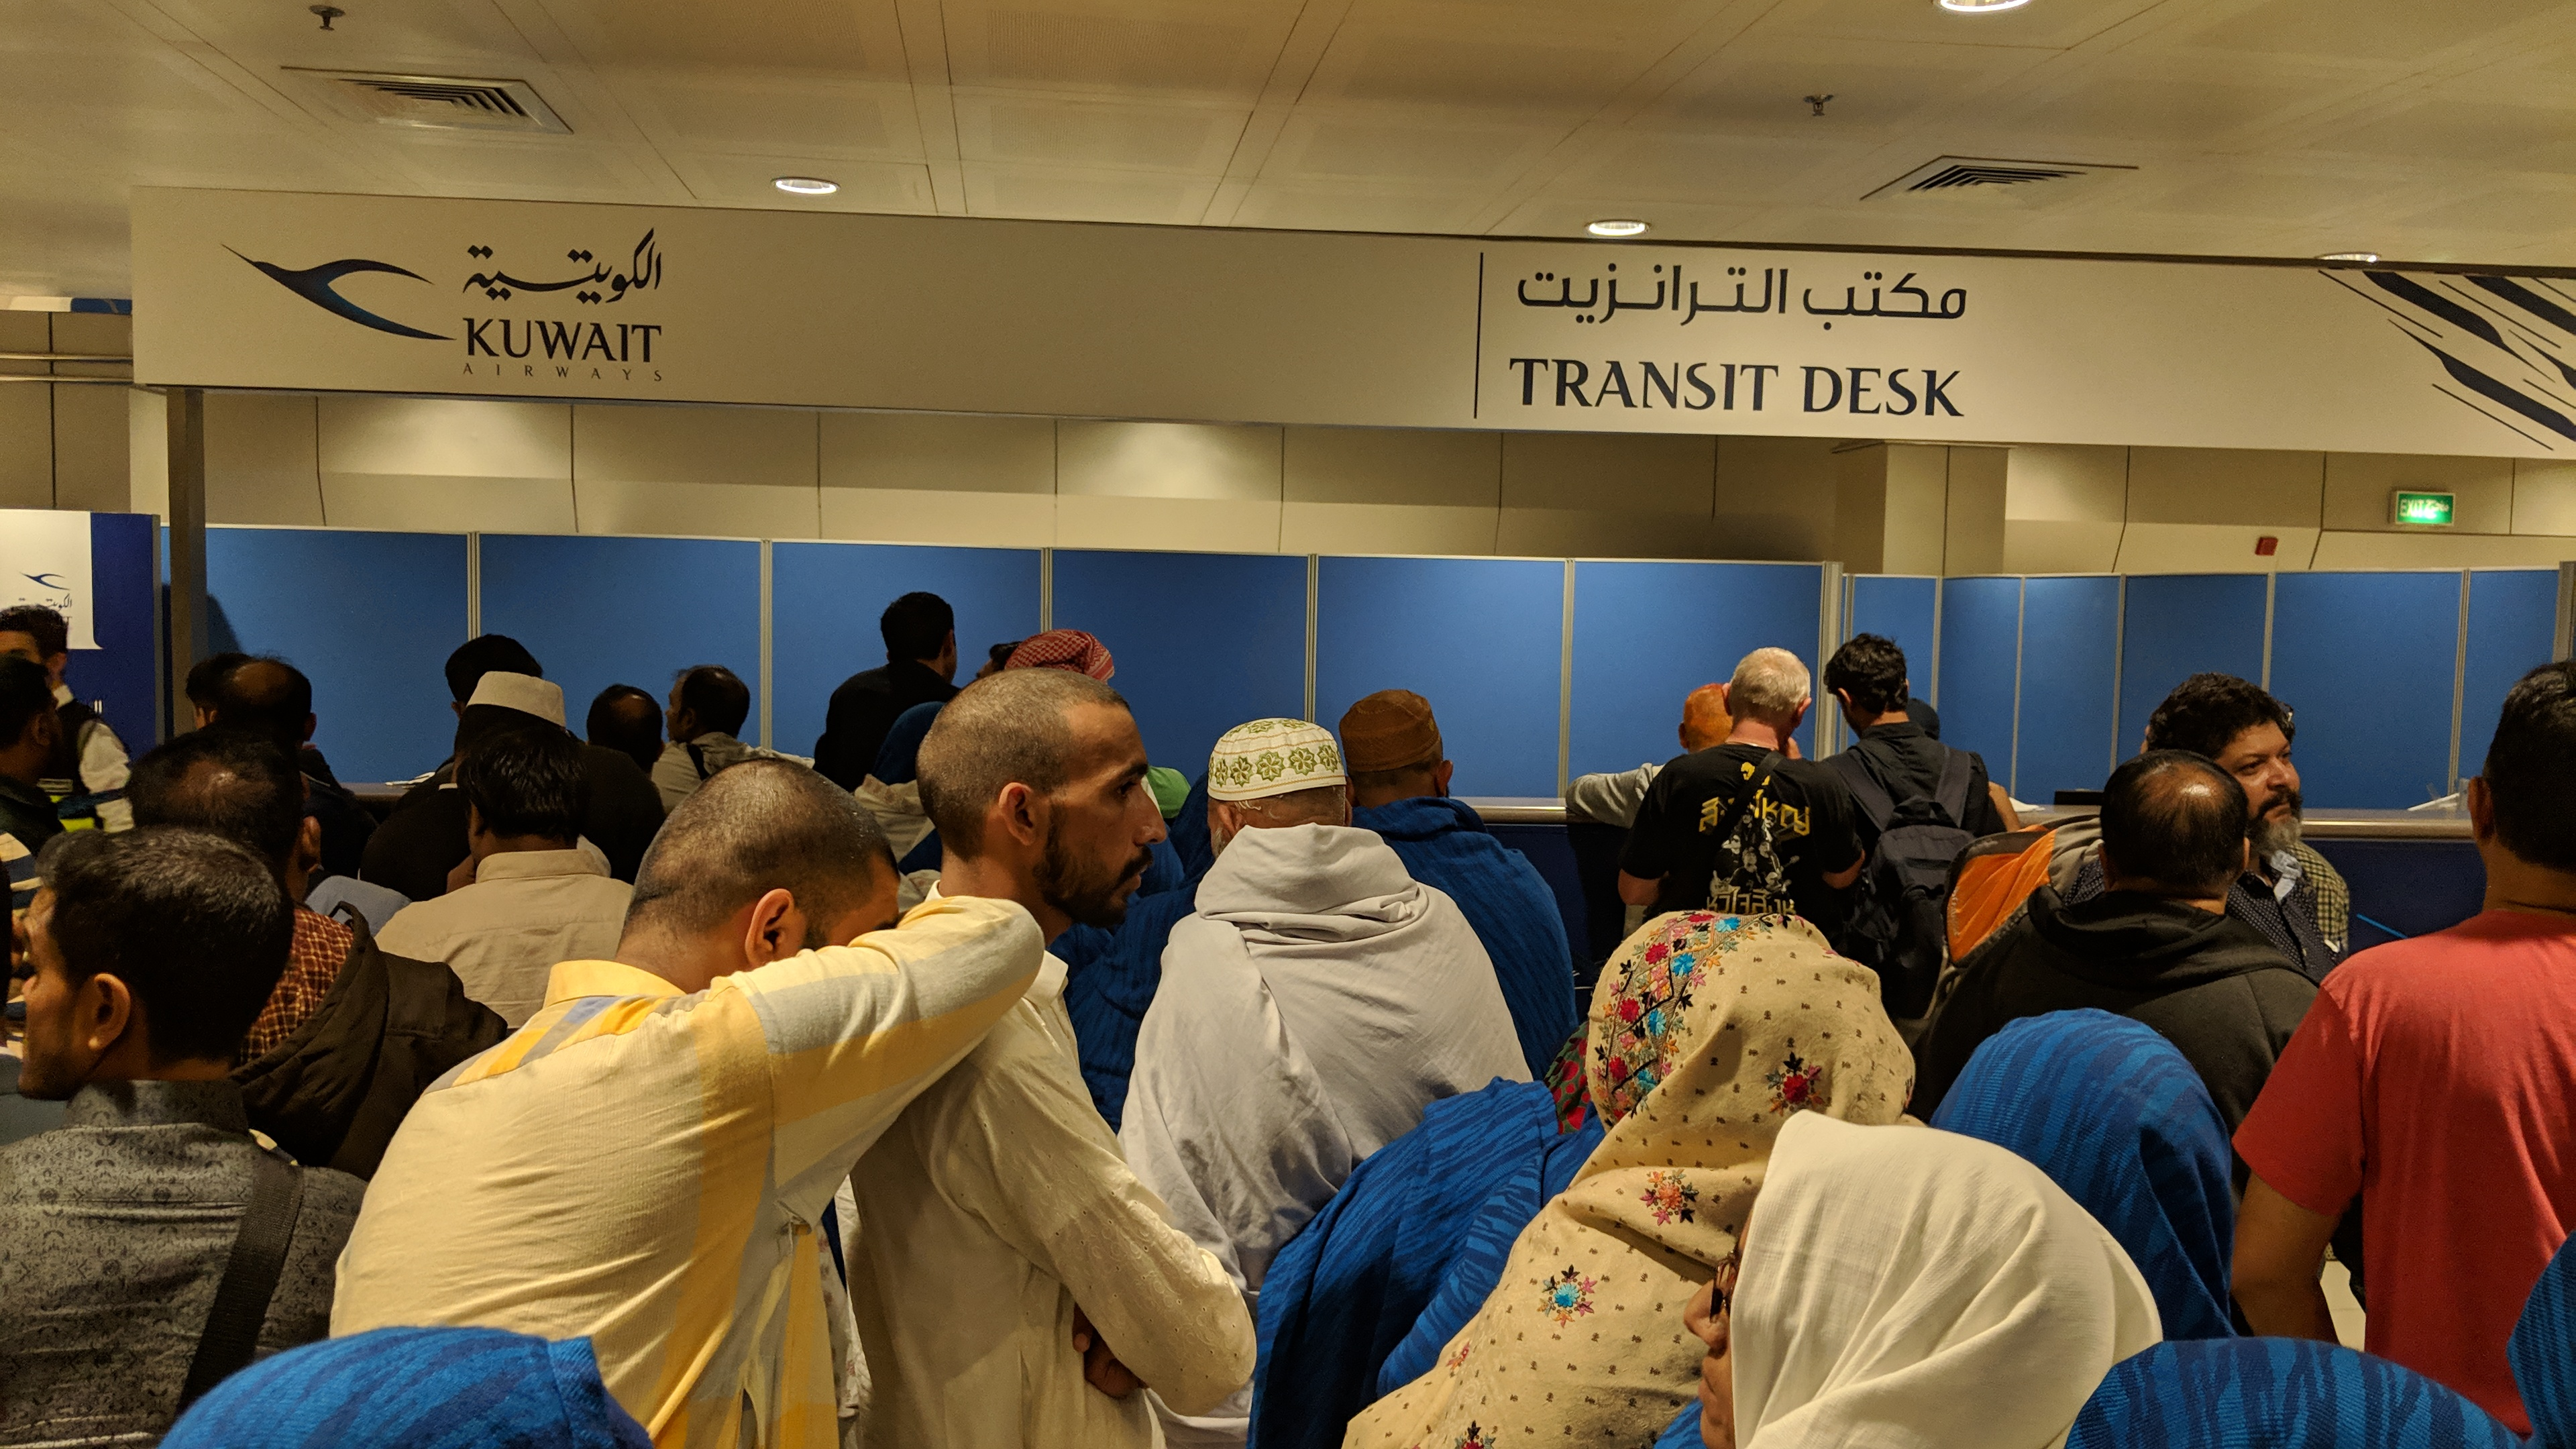 Kuwait Airways Customer Reviews | SKYTRAX